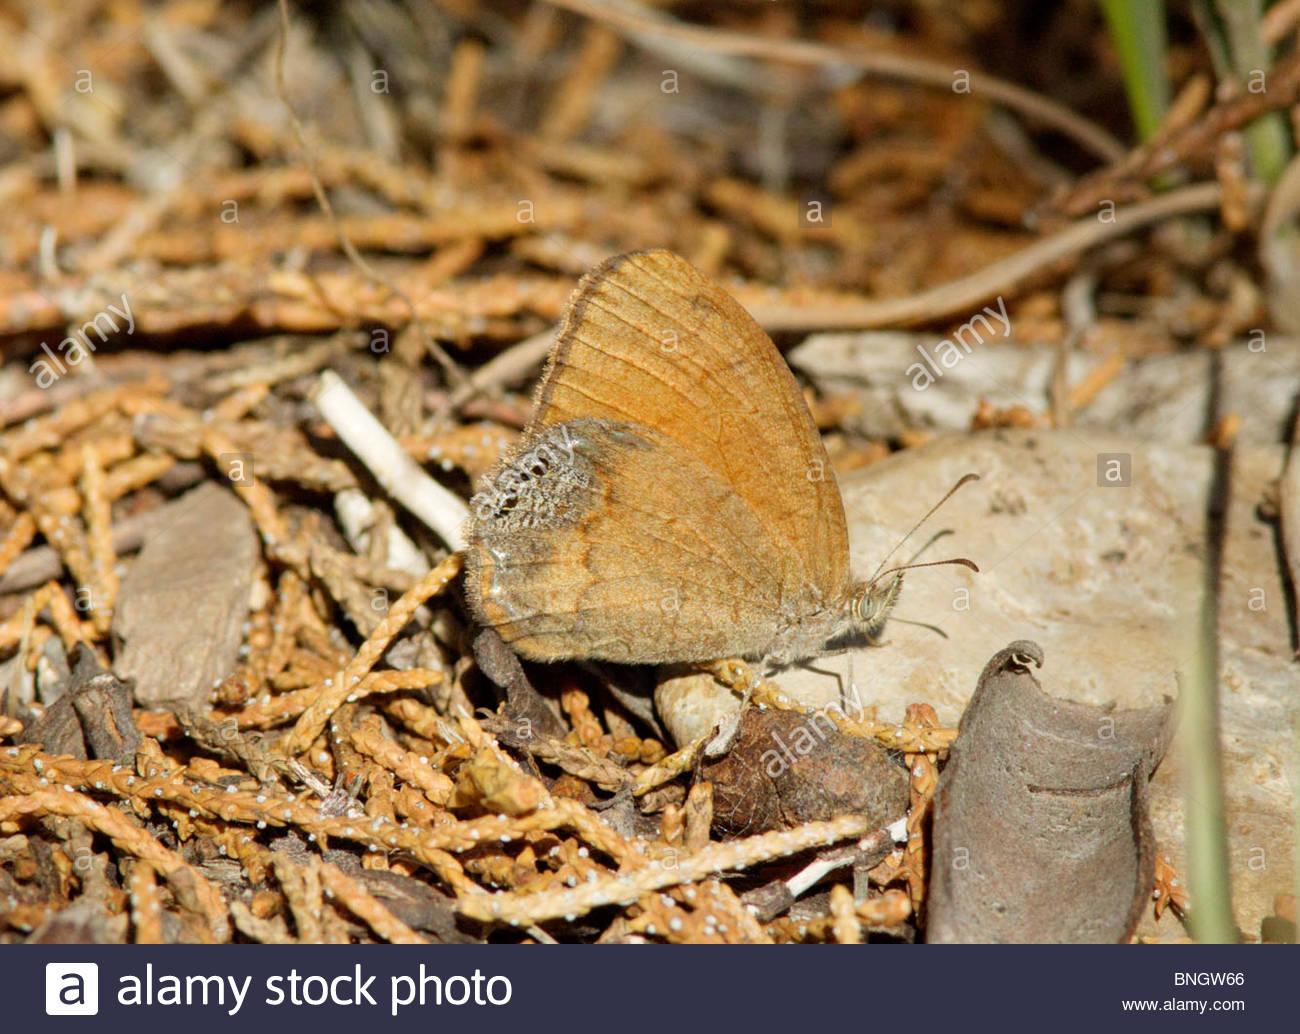 Canyonland Satyr Cyllopsis pertepida Butterfly Arizona - Stock Image